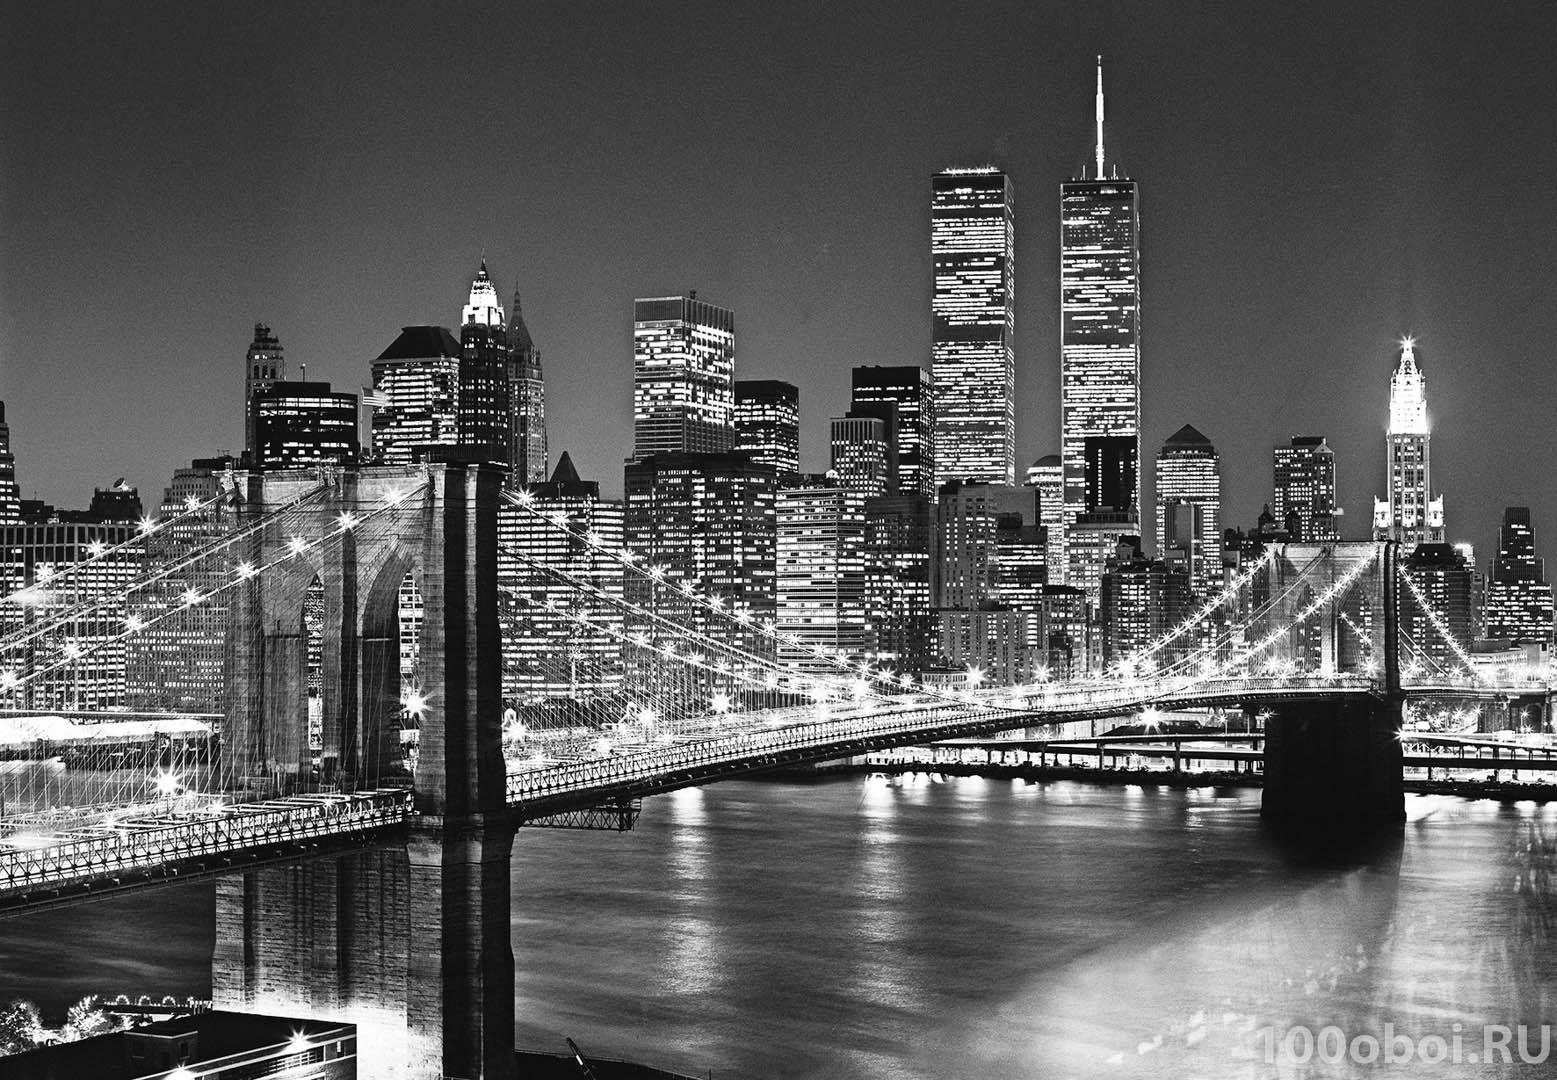 Фотообои на стену «Бруклинский мост» WG 00138 (ex 00114 ...: http://100oboi.ru/catalog/fotooboi/black_and_white/fotooboi_wg_00138_brooklyn_bridge/